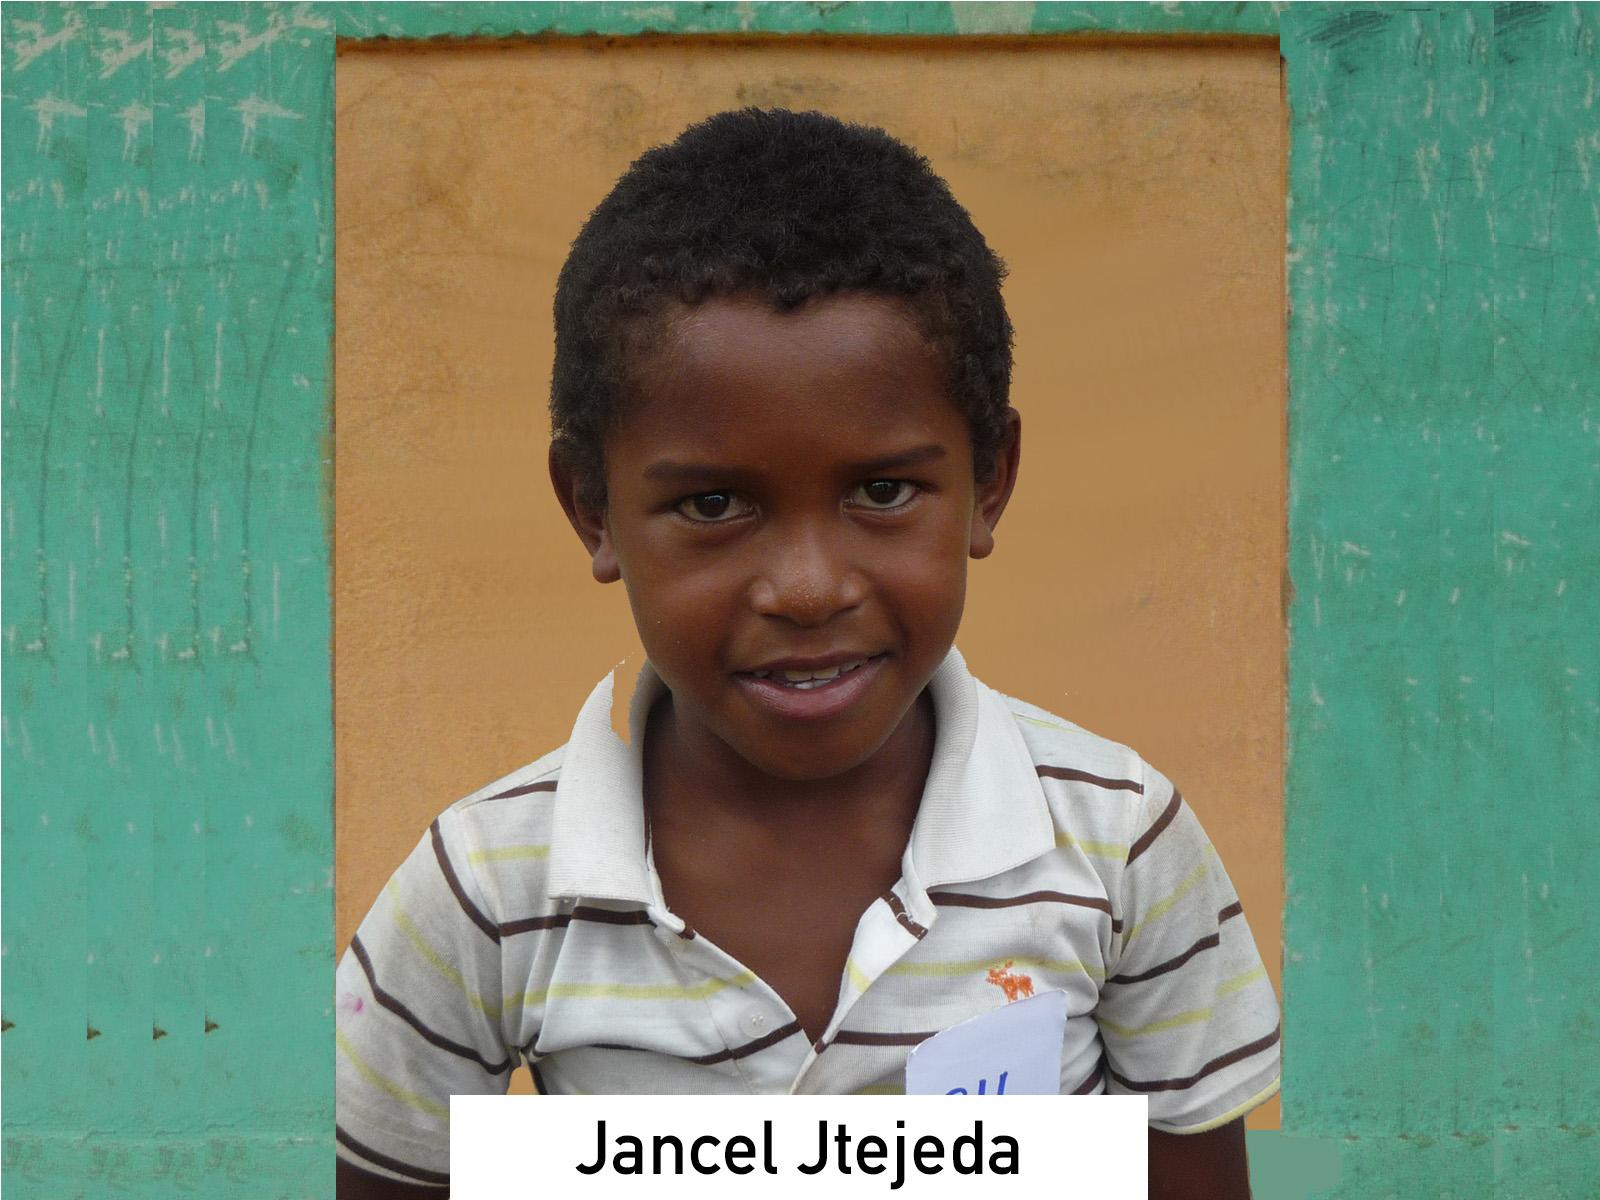 034 - Jancel Jtejeda.jpg